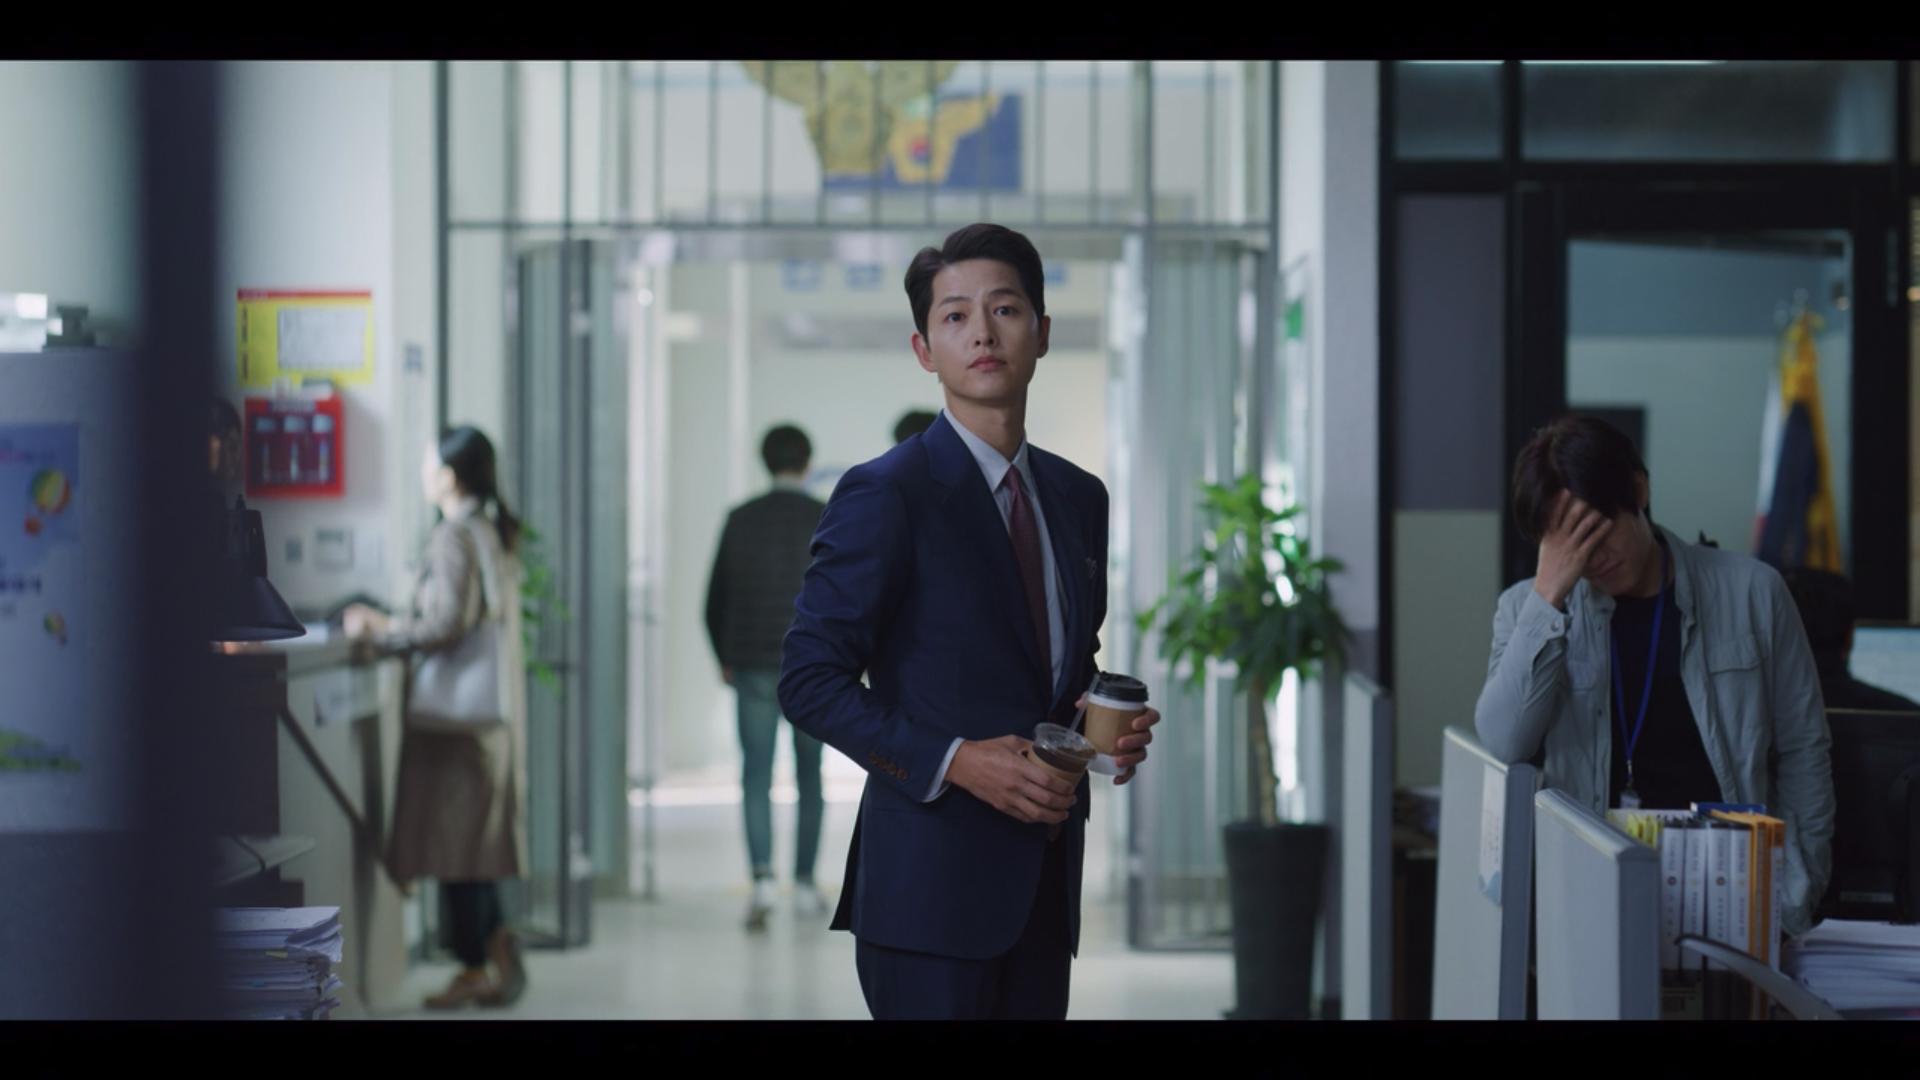 10 Snacks and Drinks You Often See In Korean Dramas: Banana Milk, Tteokbokki, Iced Americano And More